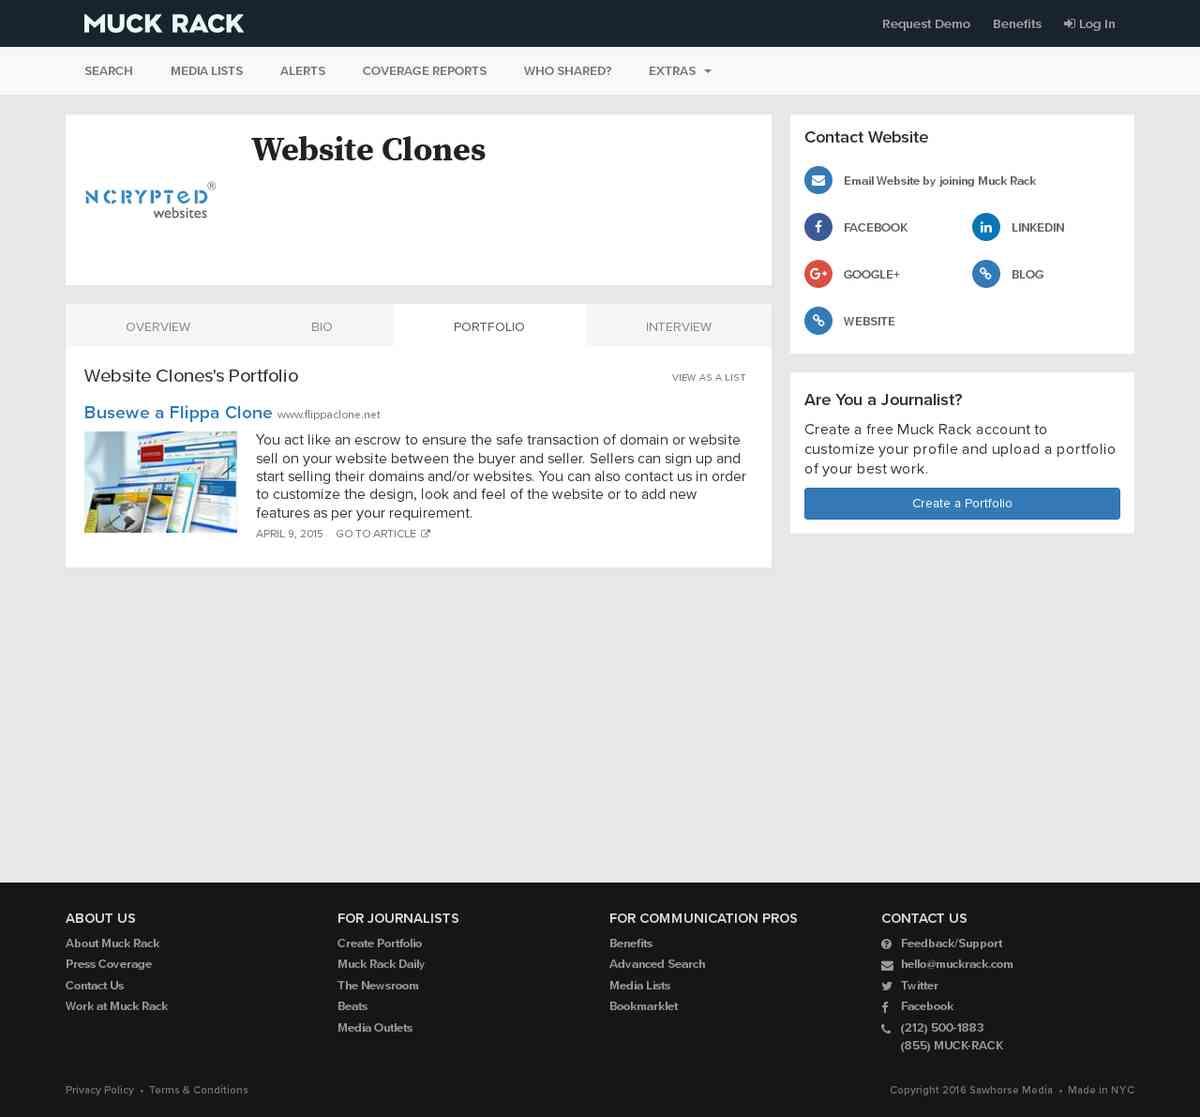 muckrack.com/website-clones/portfolio/KQh/busewe-a-flippa-clone